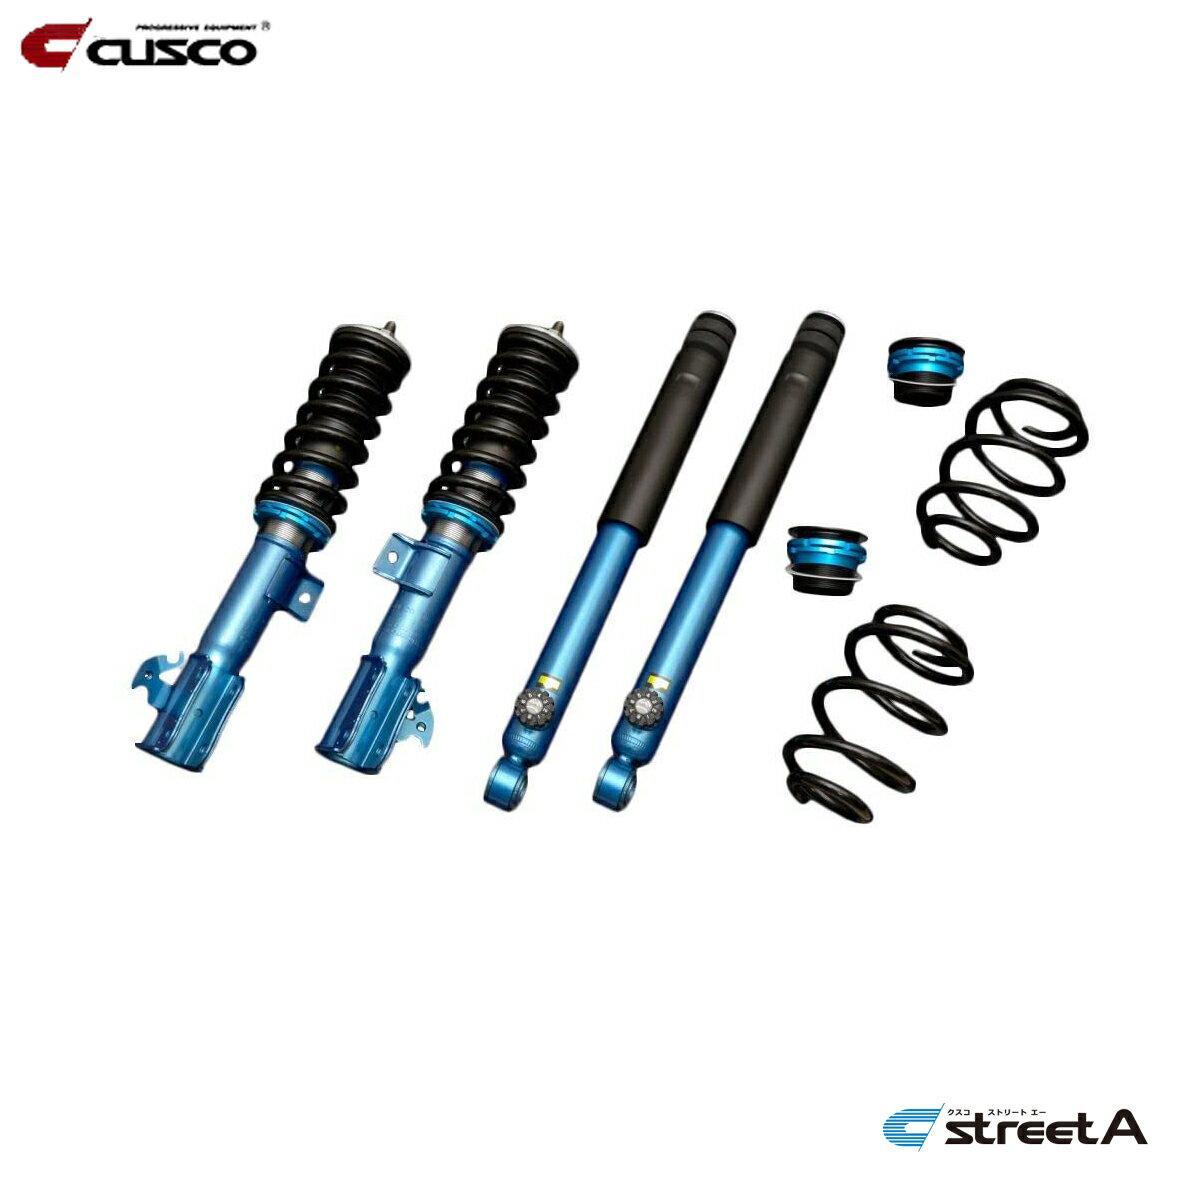 CUSCO クスコ ピノ HC24S 車高調 全長固定式 631-62J-CBA